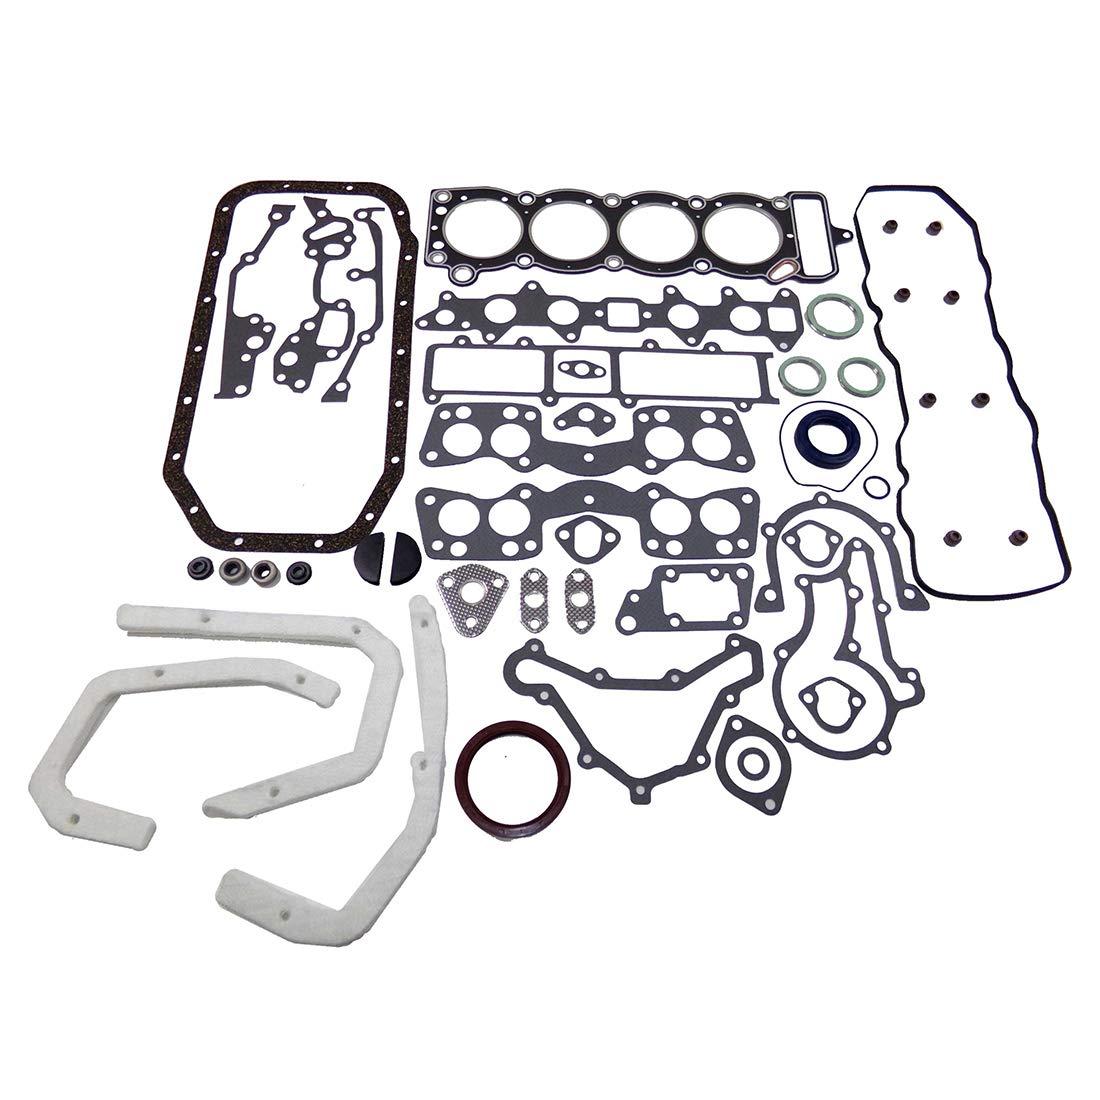 Corona DNJ Full Gasket//Sealing Set FGS9002// For 75-80 Toyota// Celica Pickup 2.2L L4 SOHC Naturally Aspirated designation 20R